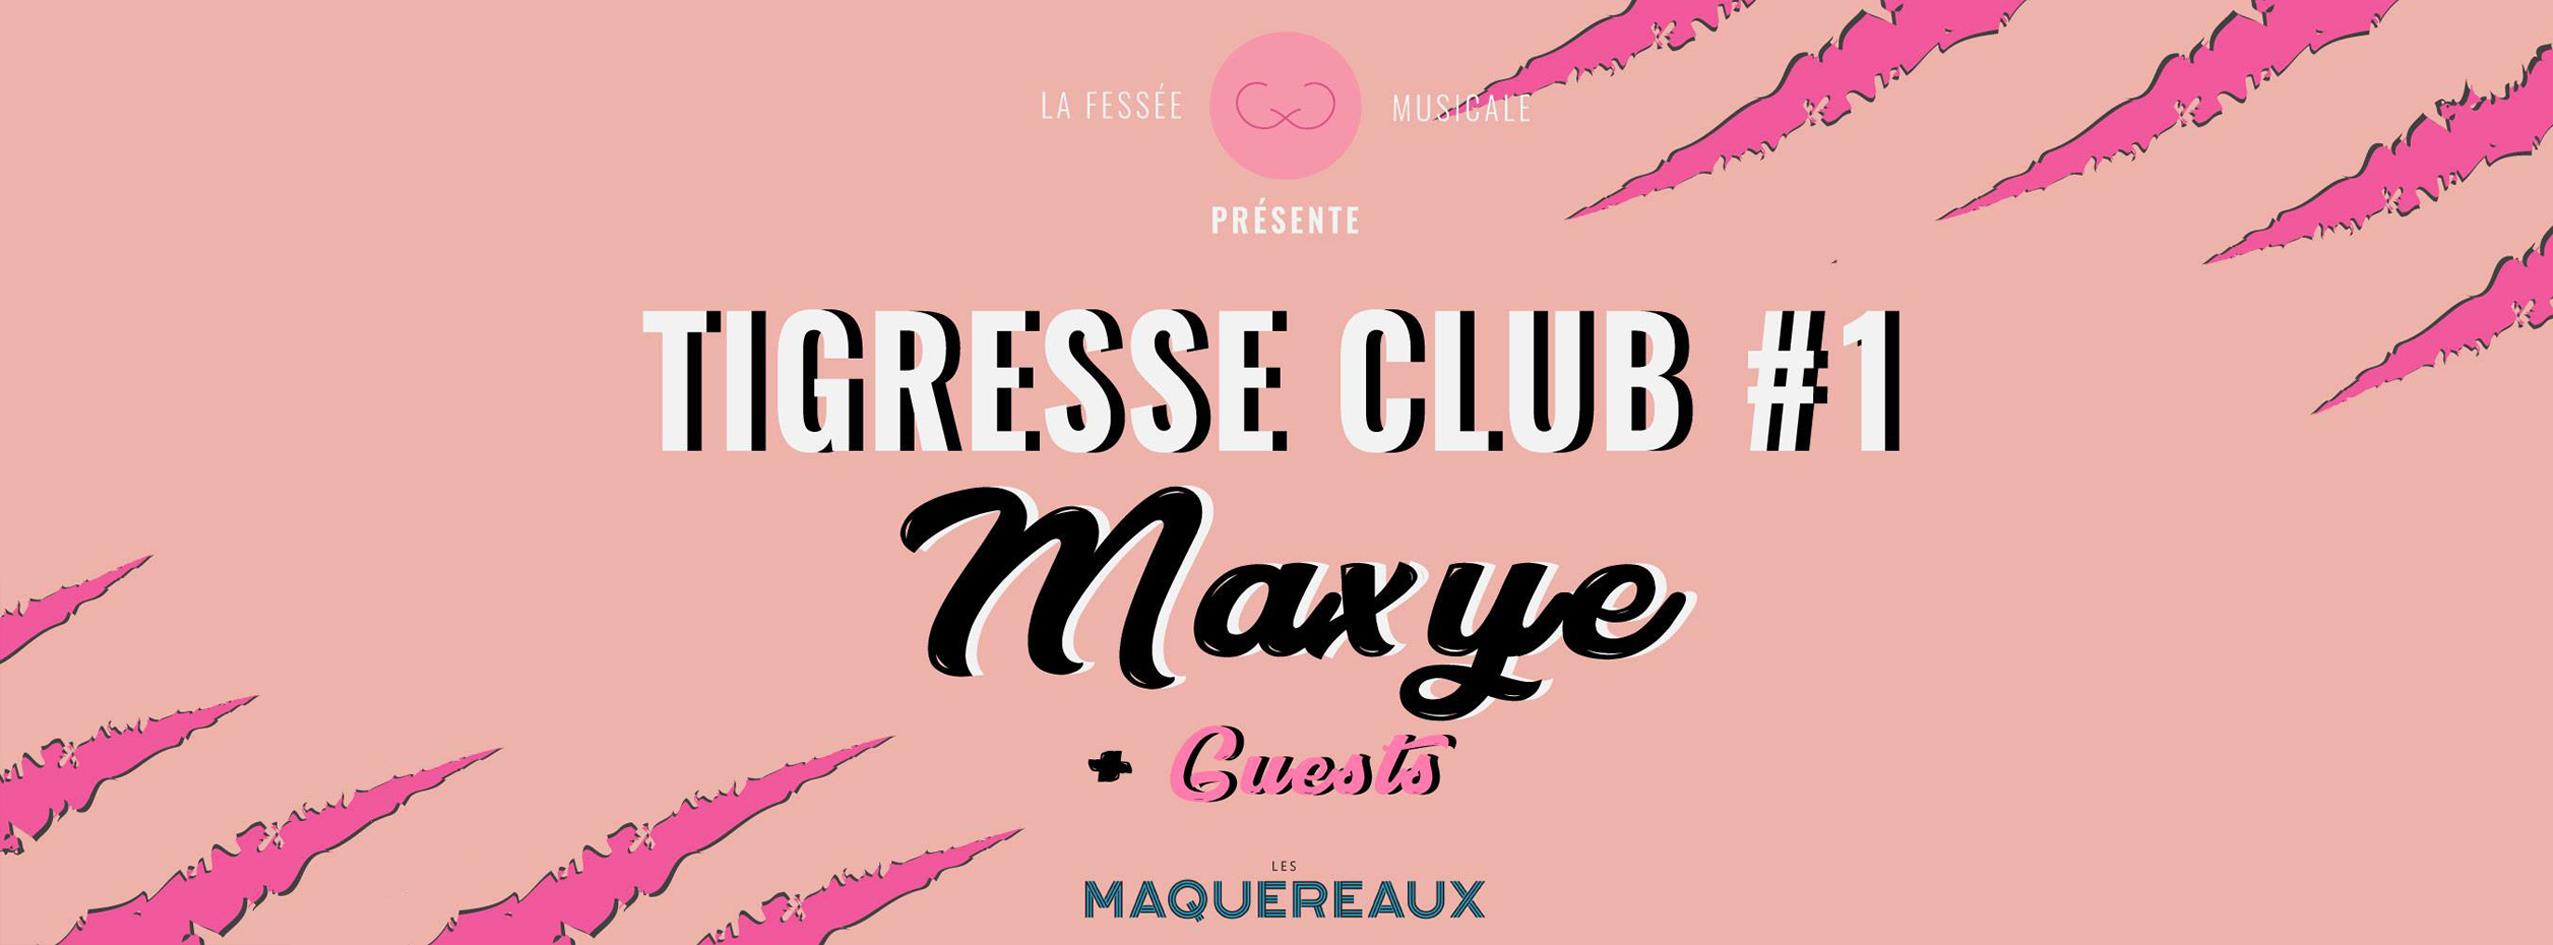 Tigresse Club #1 : MAXYE & Guests